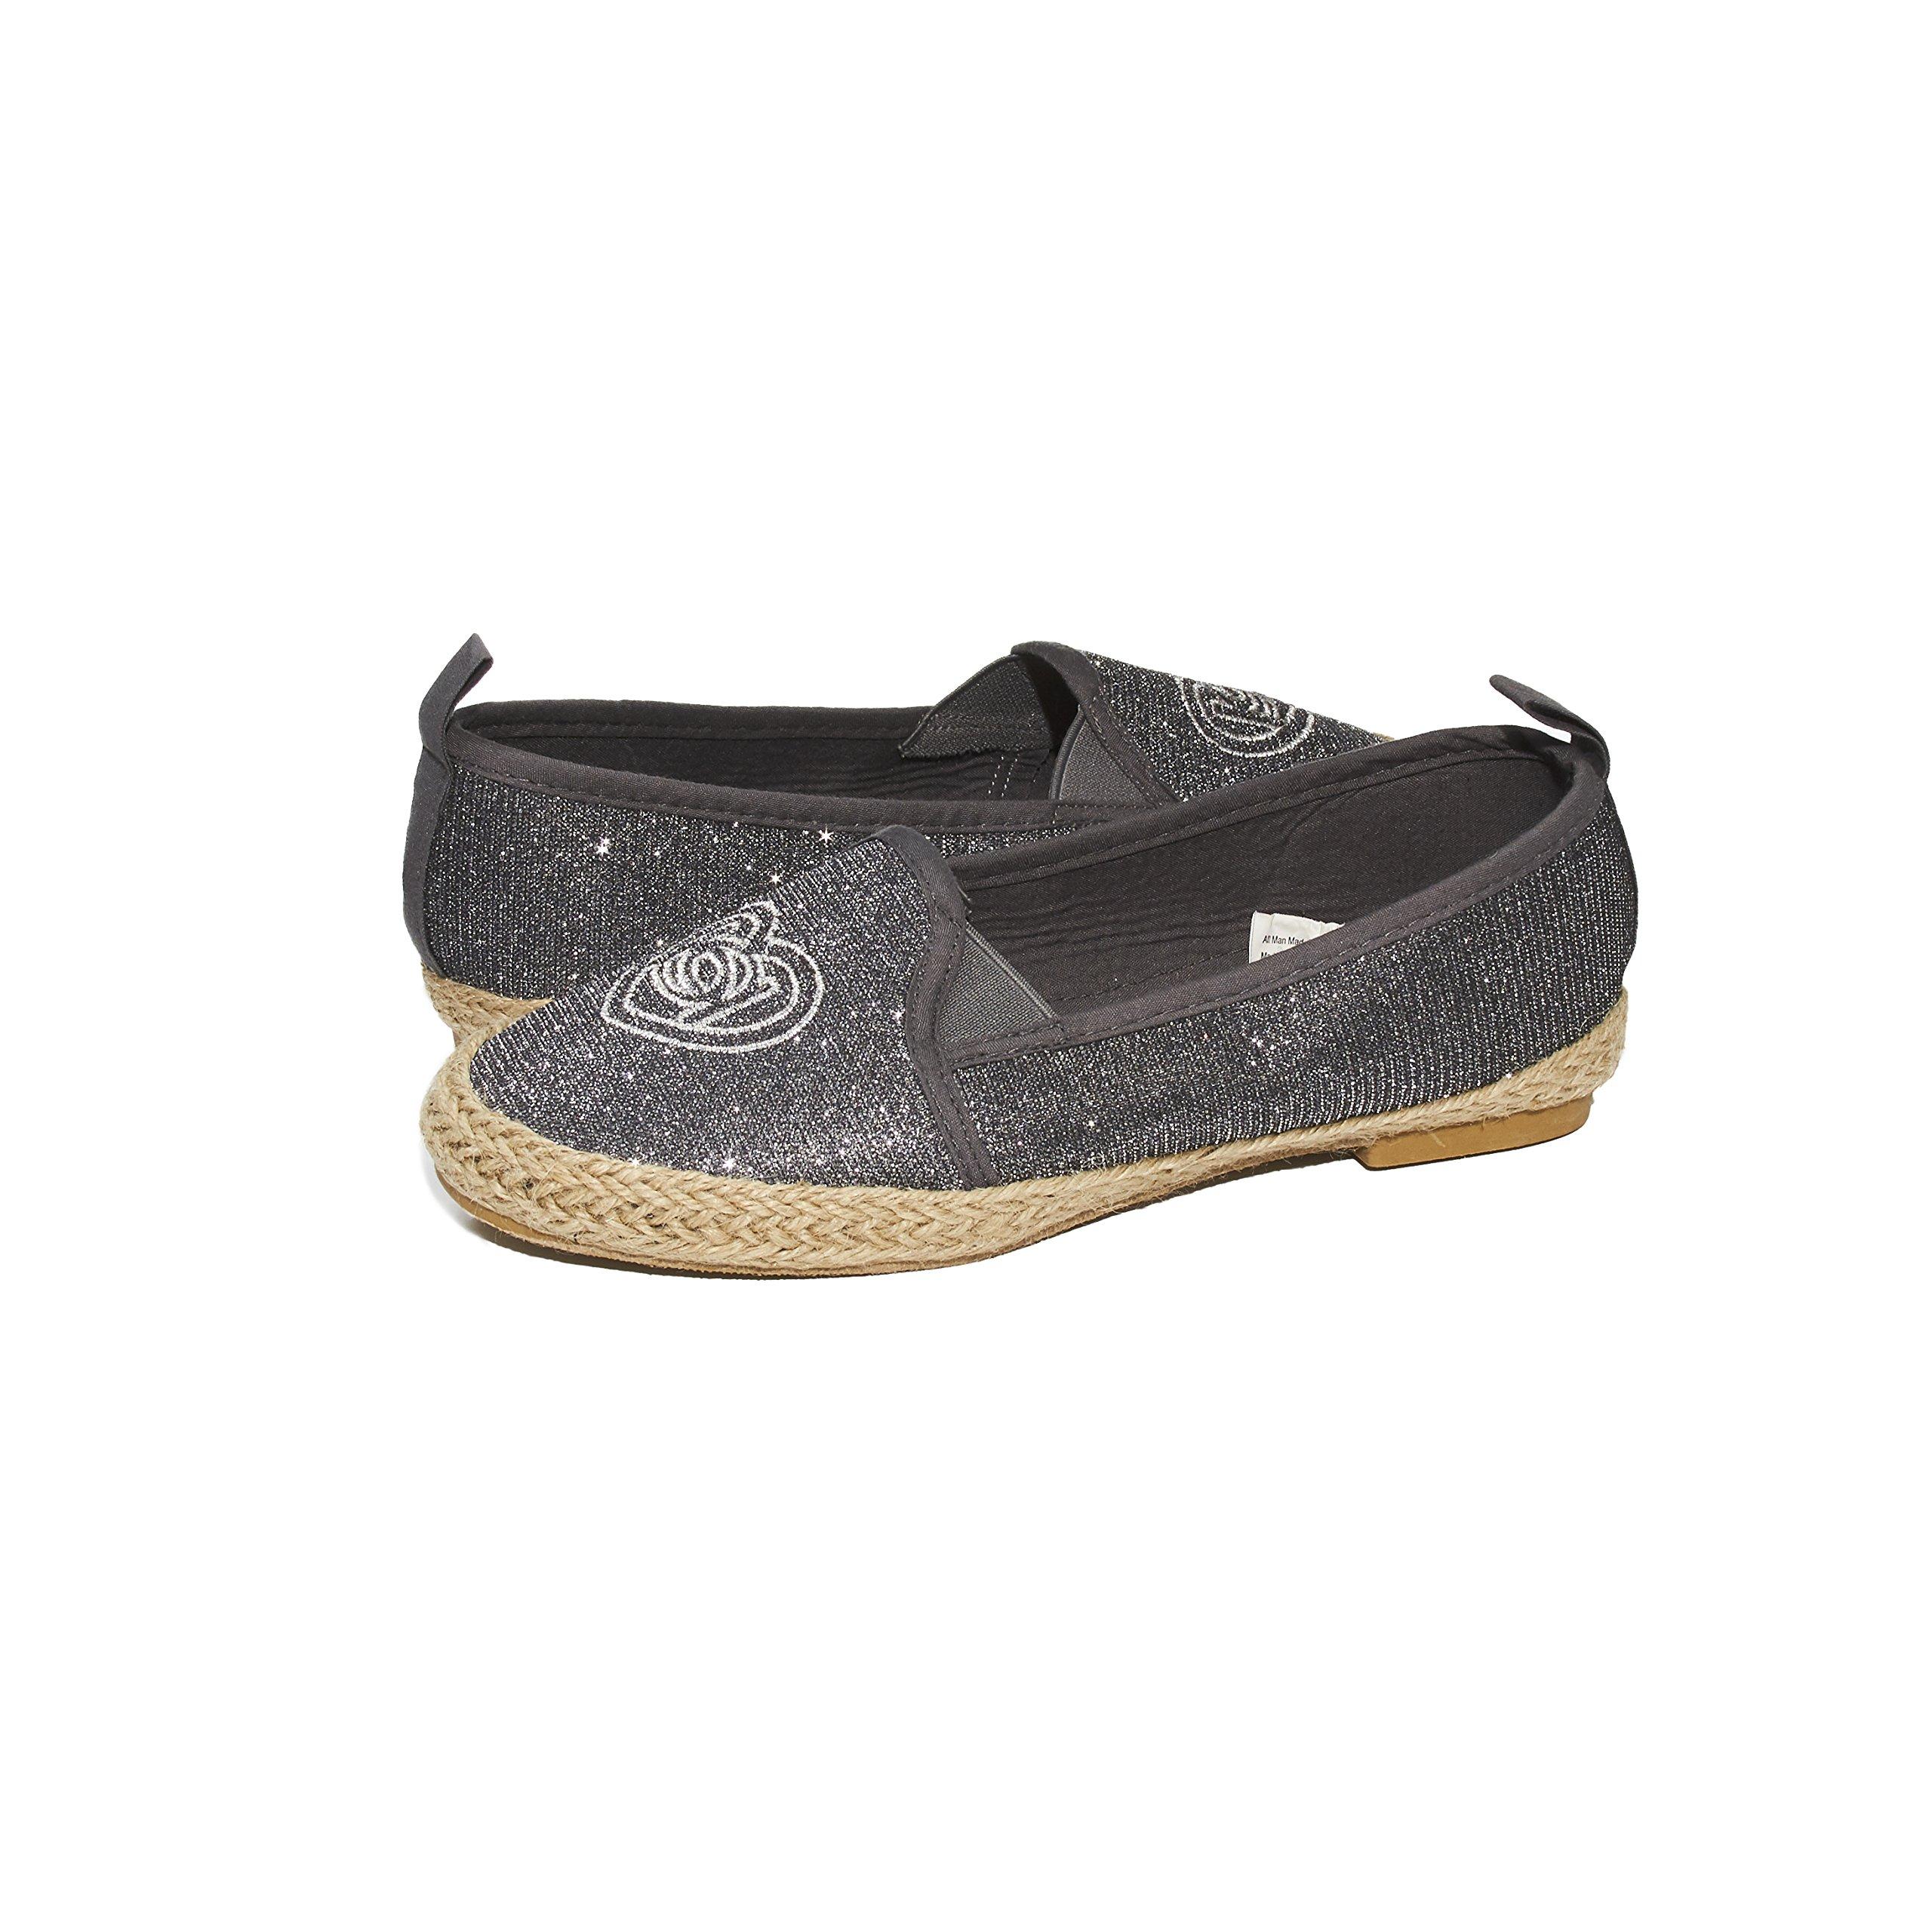 bebe Girls Big Kid Beachy Espadrille Slip-On Loafer Flat Glitter Mesh Shoe Size 2 Pewter